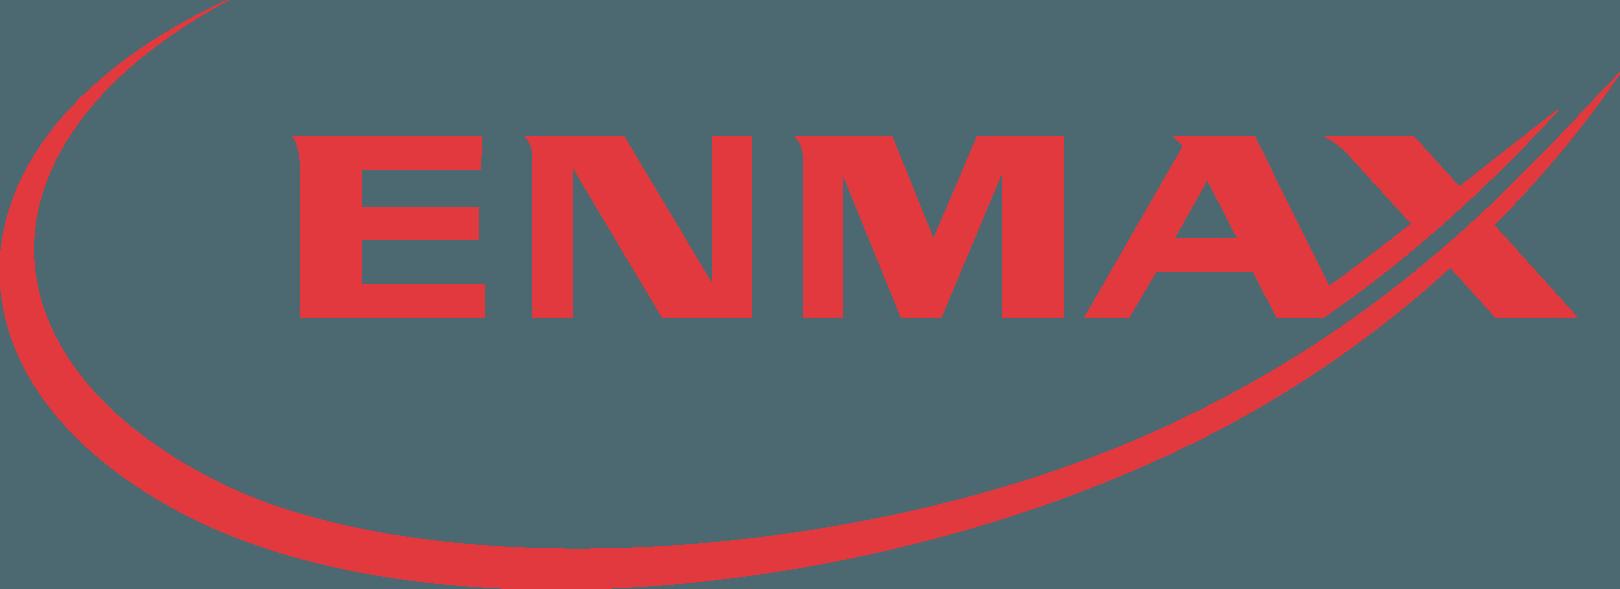 Enmax Logo png